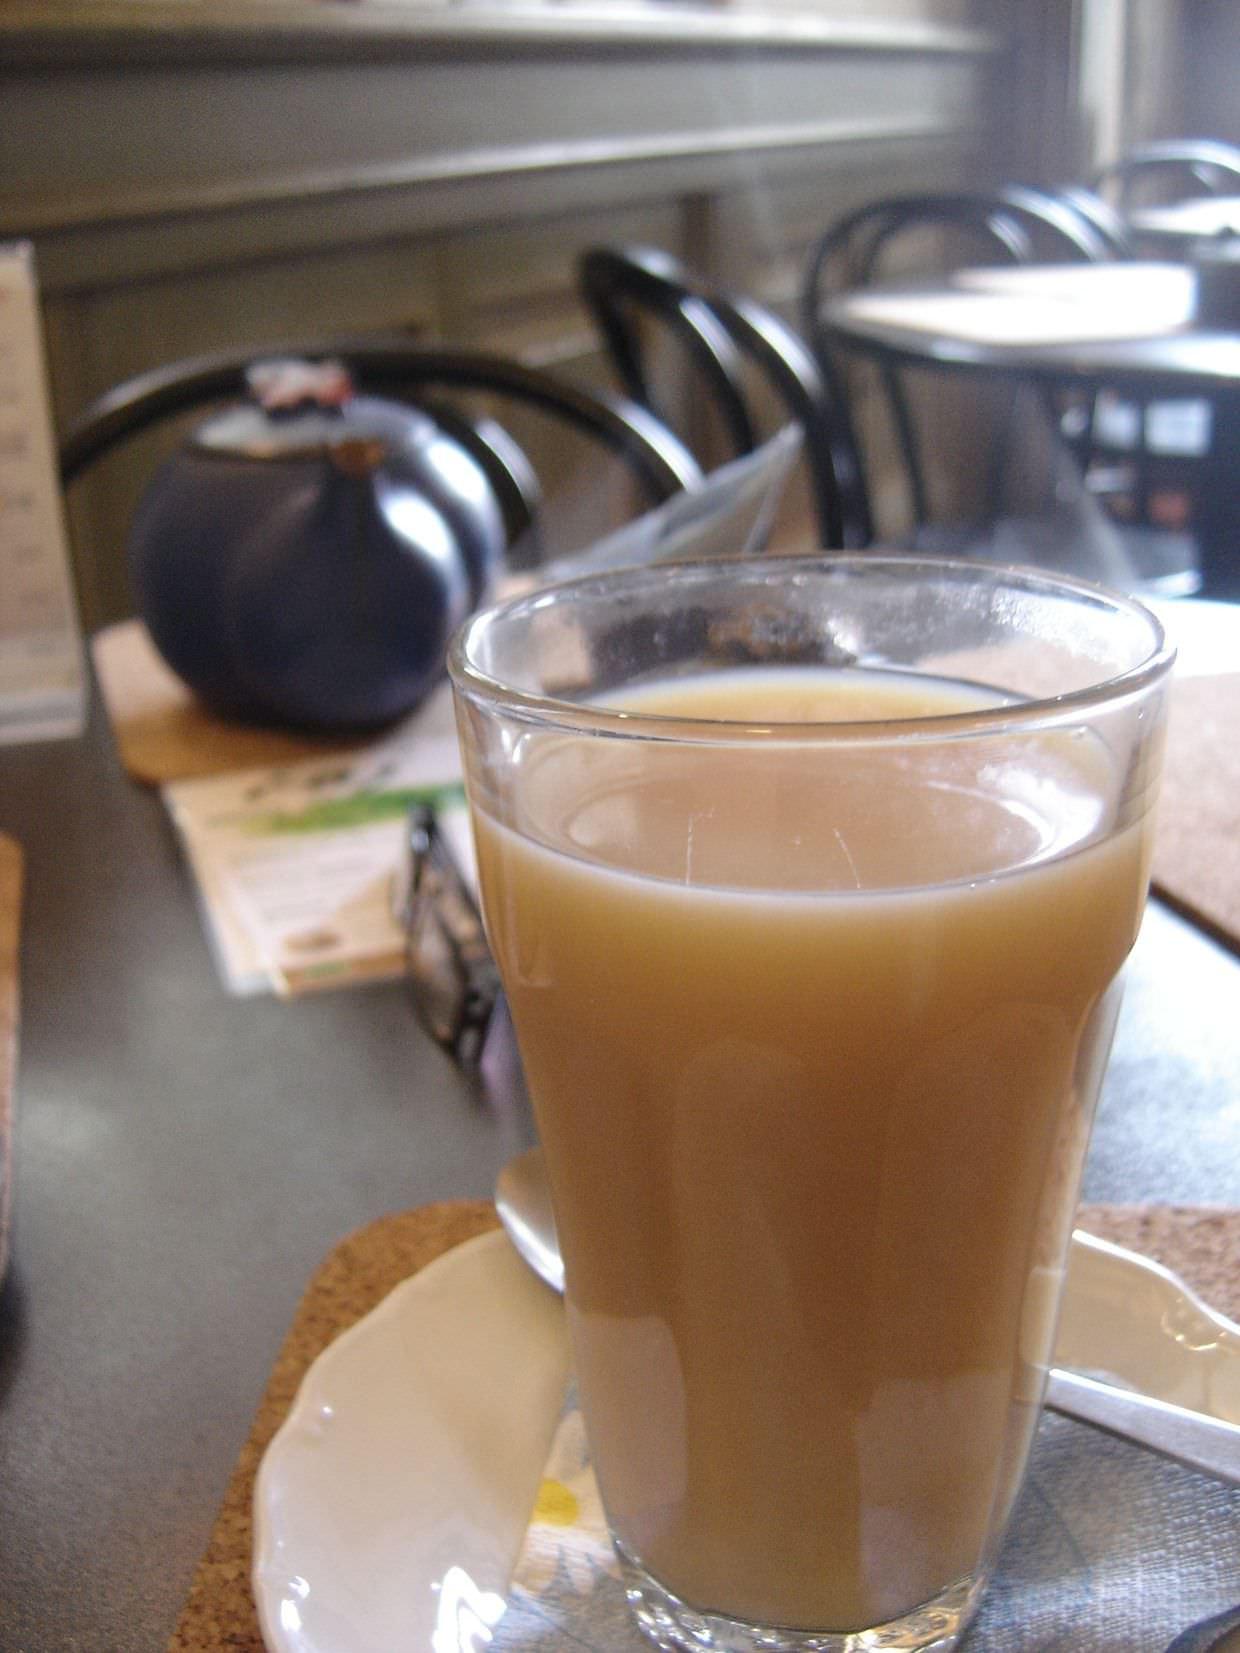 Smoked moldovian tea at U Zeleneho Yaje